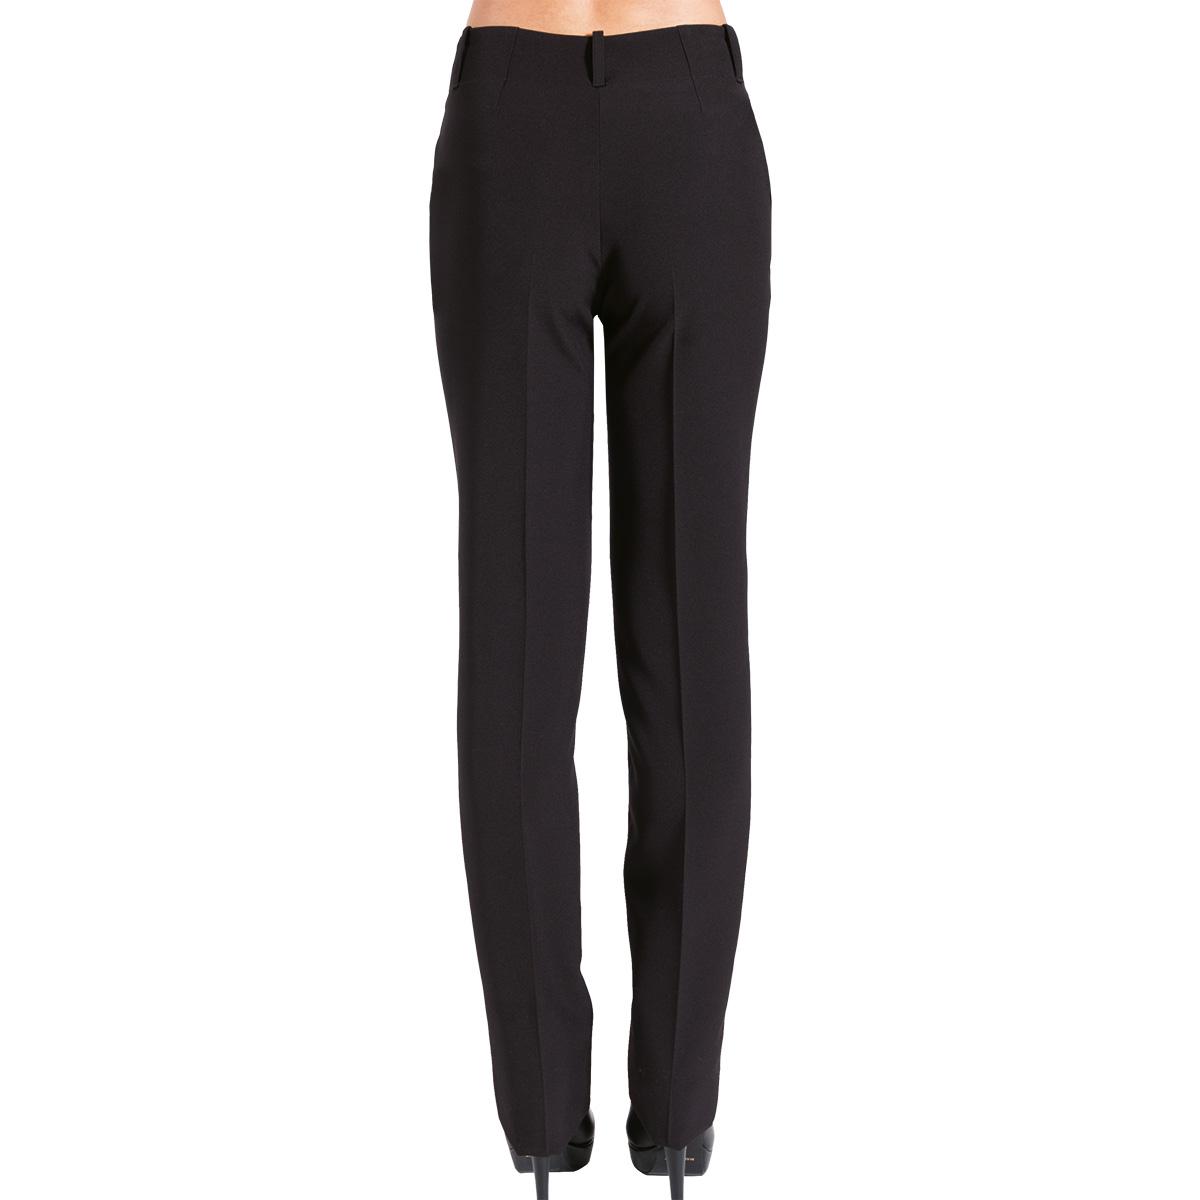 pantalone-nero-donna